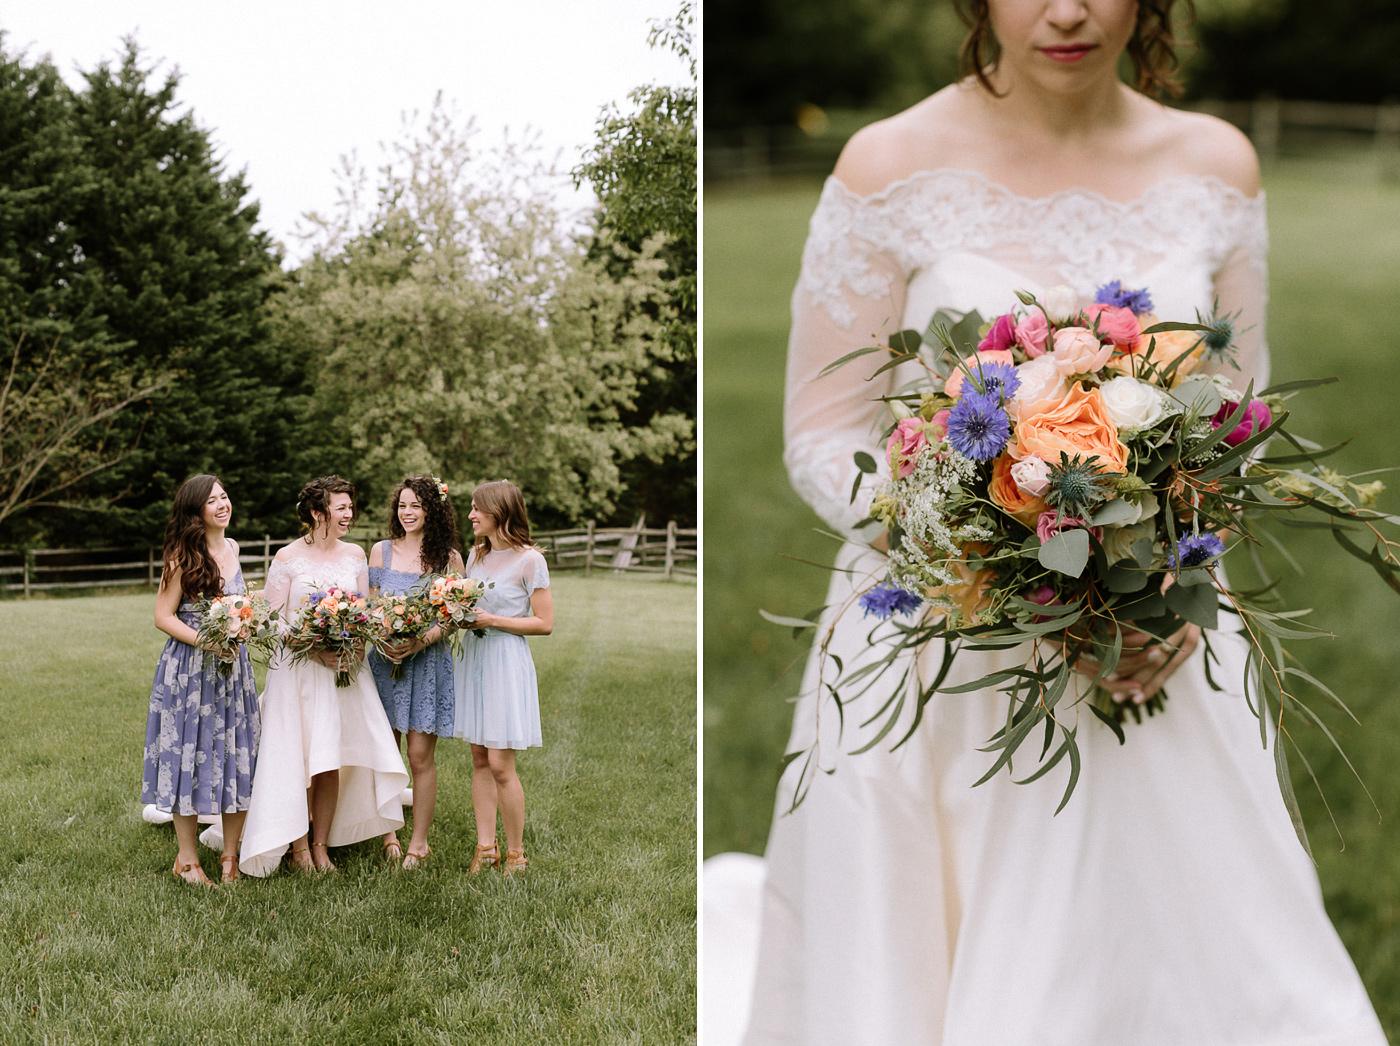 Bride and bridesmaids portraits florals